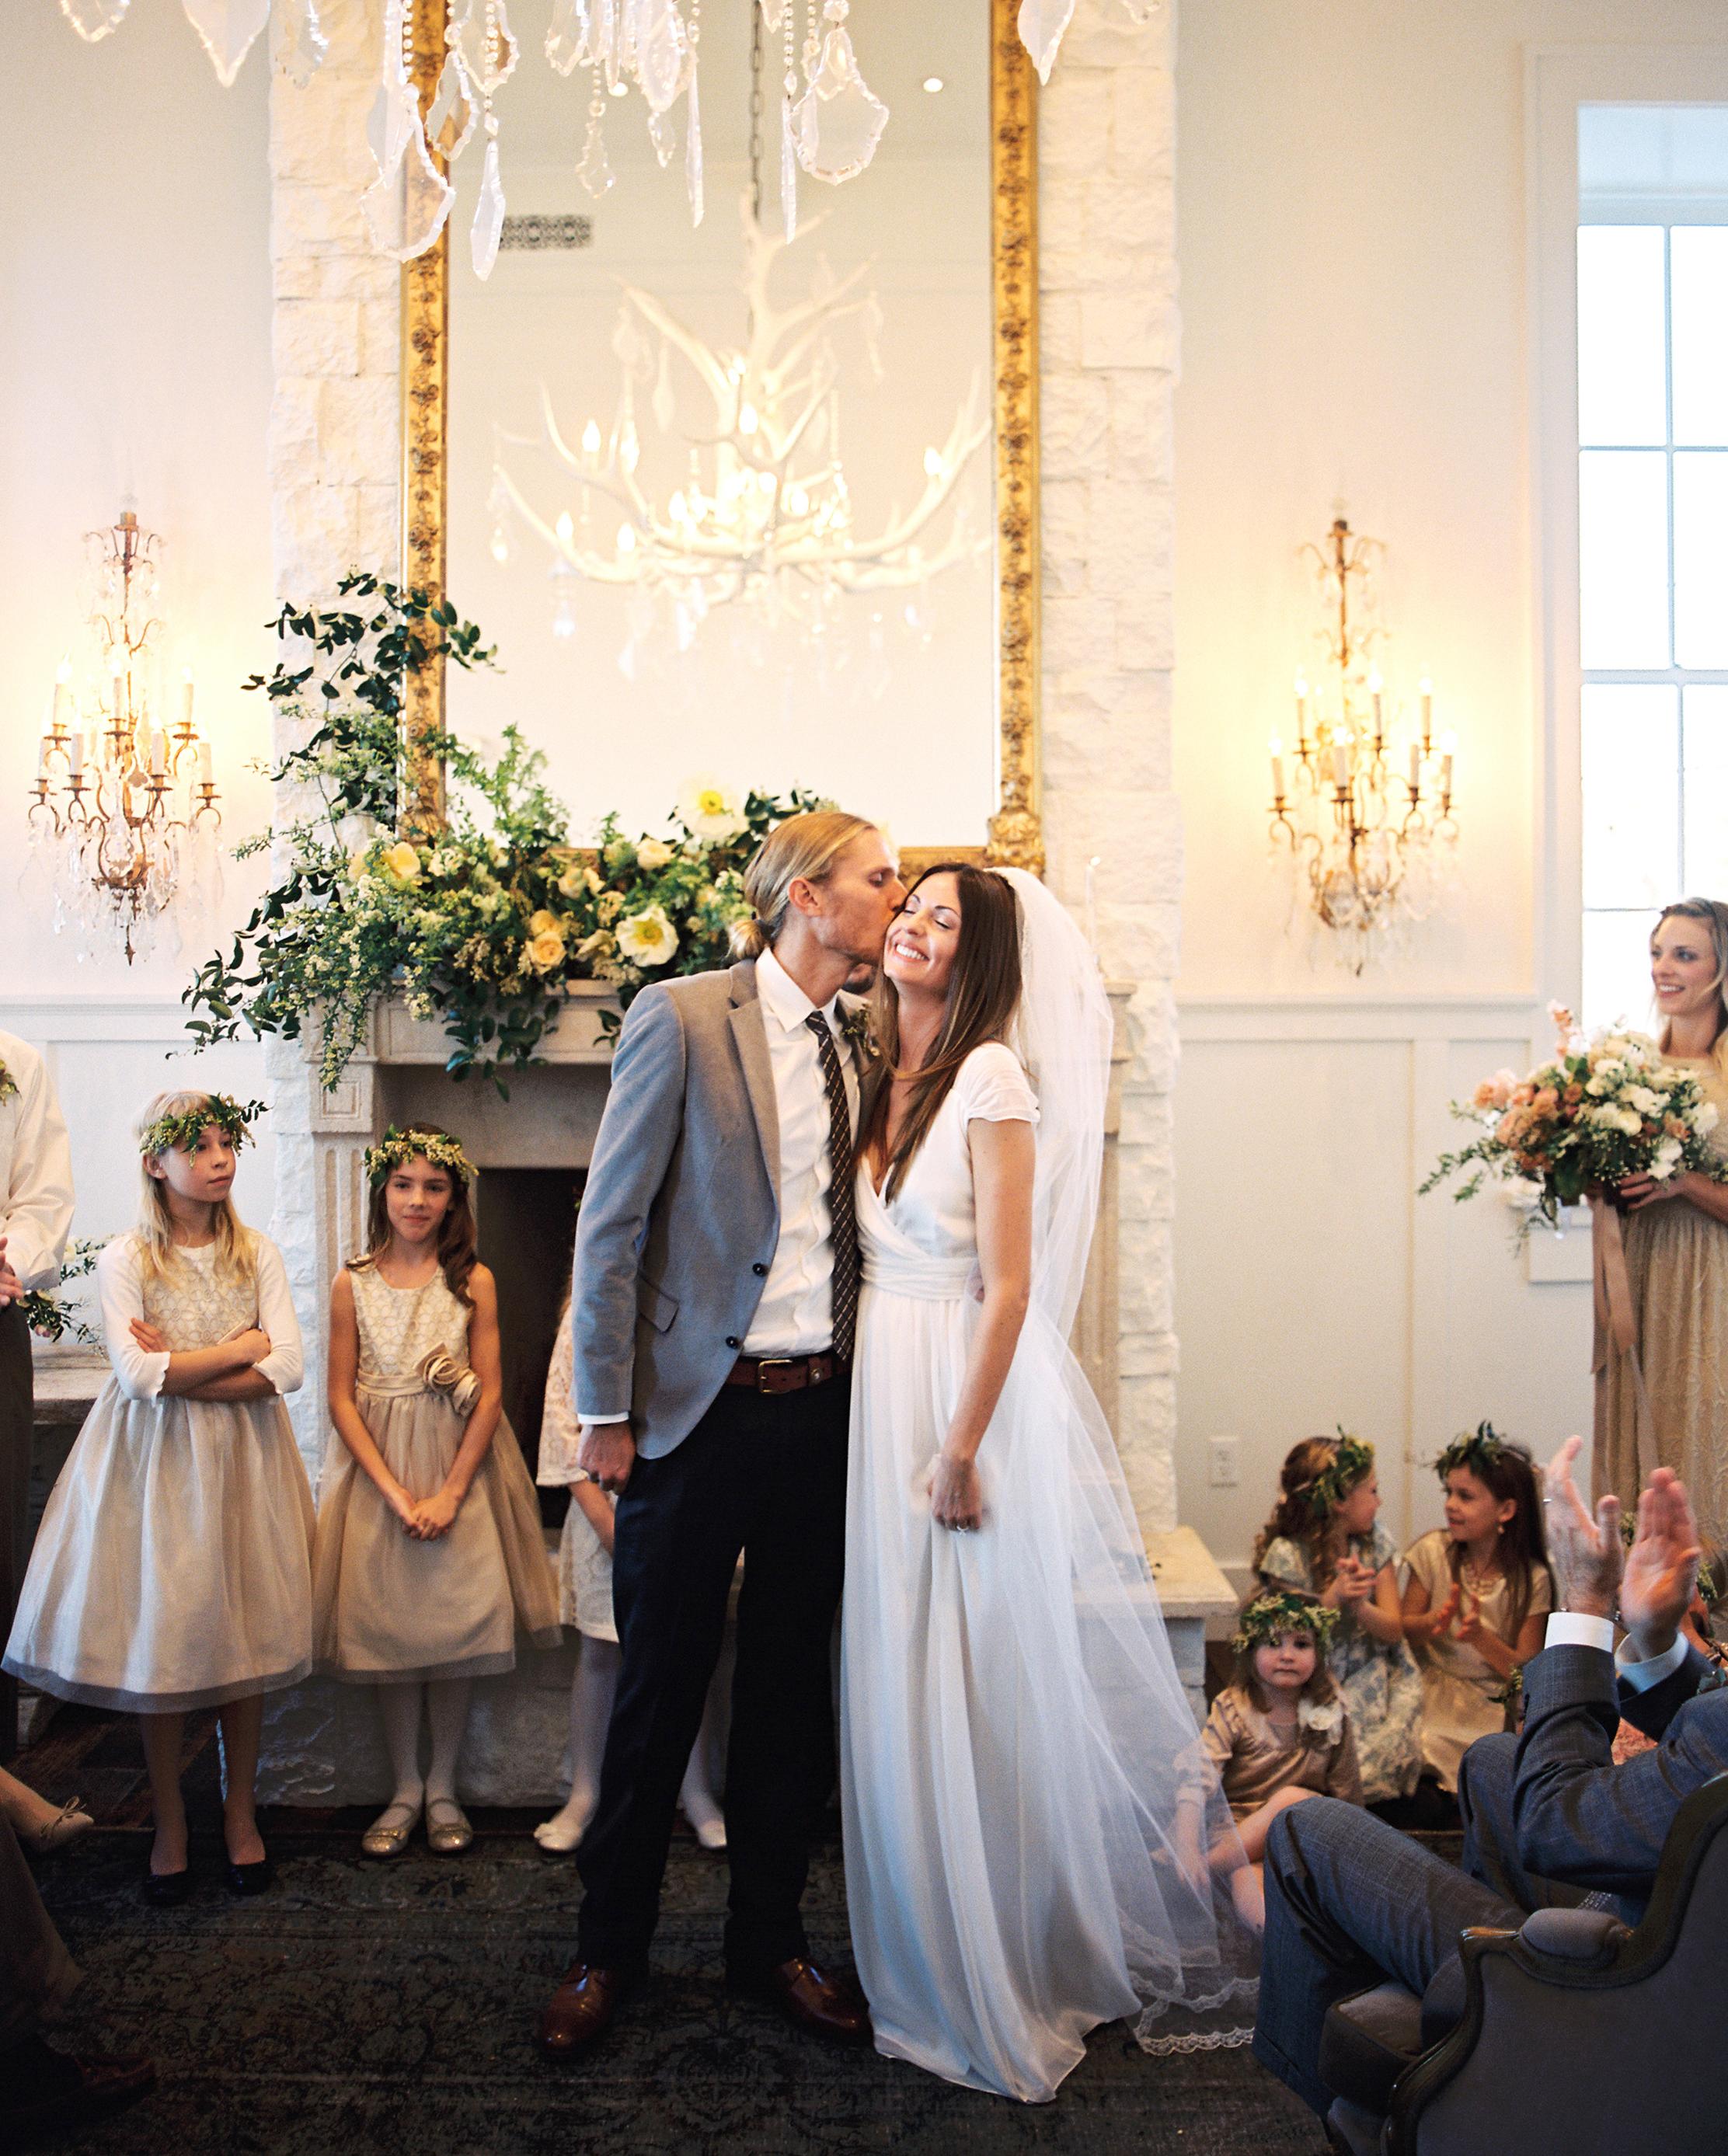 rachel-tyson-wedding-kiss-074-s112158-0915.jpg